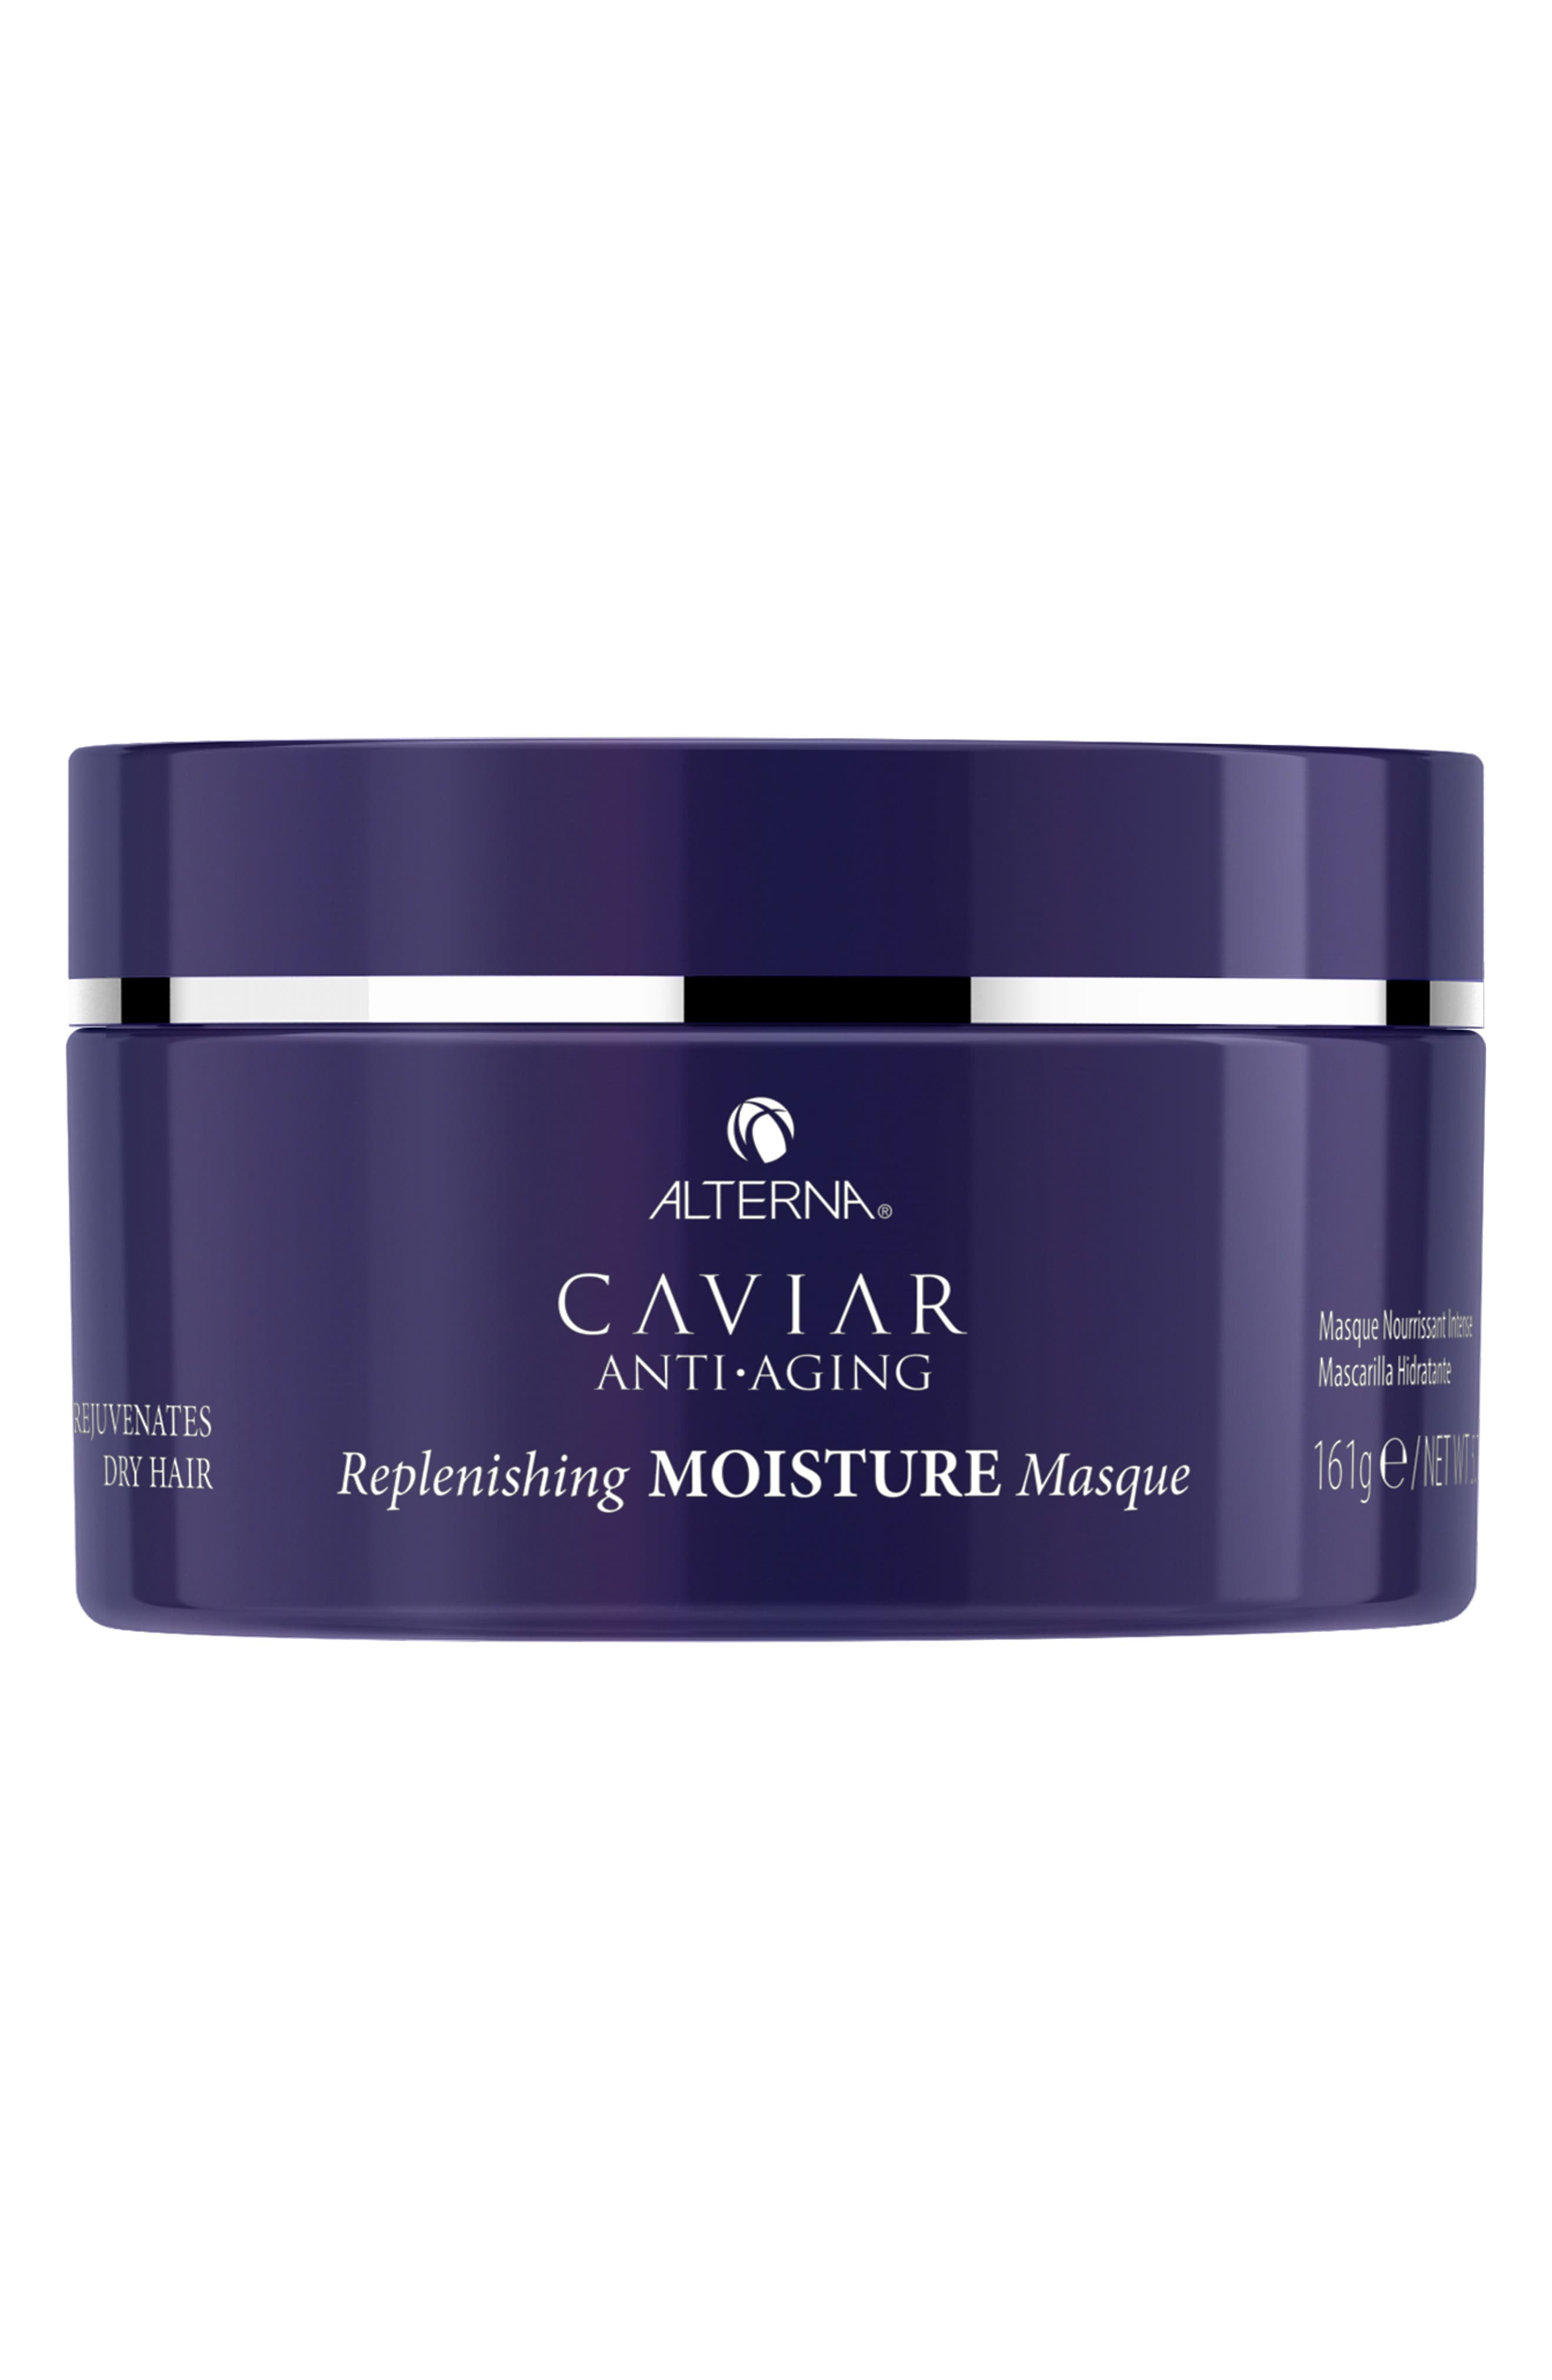 Alterna Caviar Anti-Aging Replenishing Moisture Masque